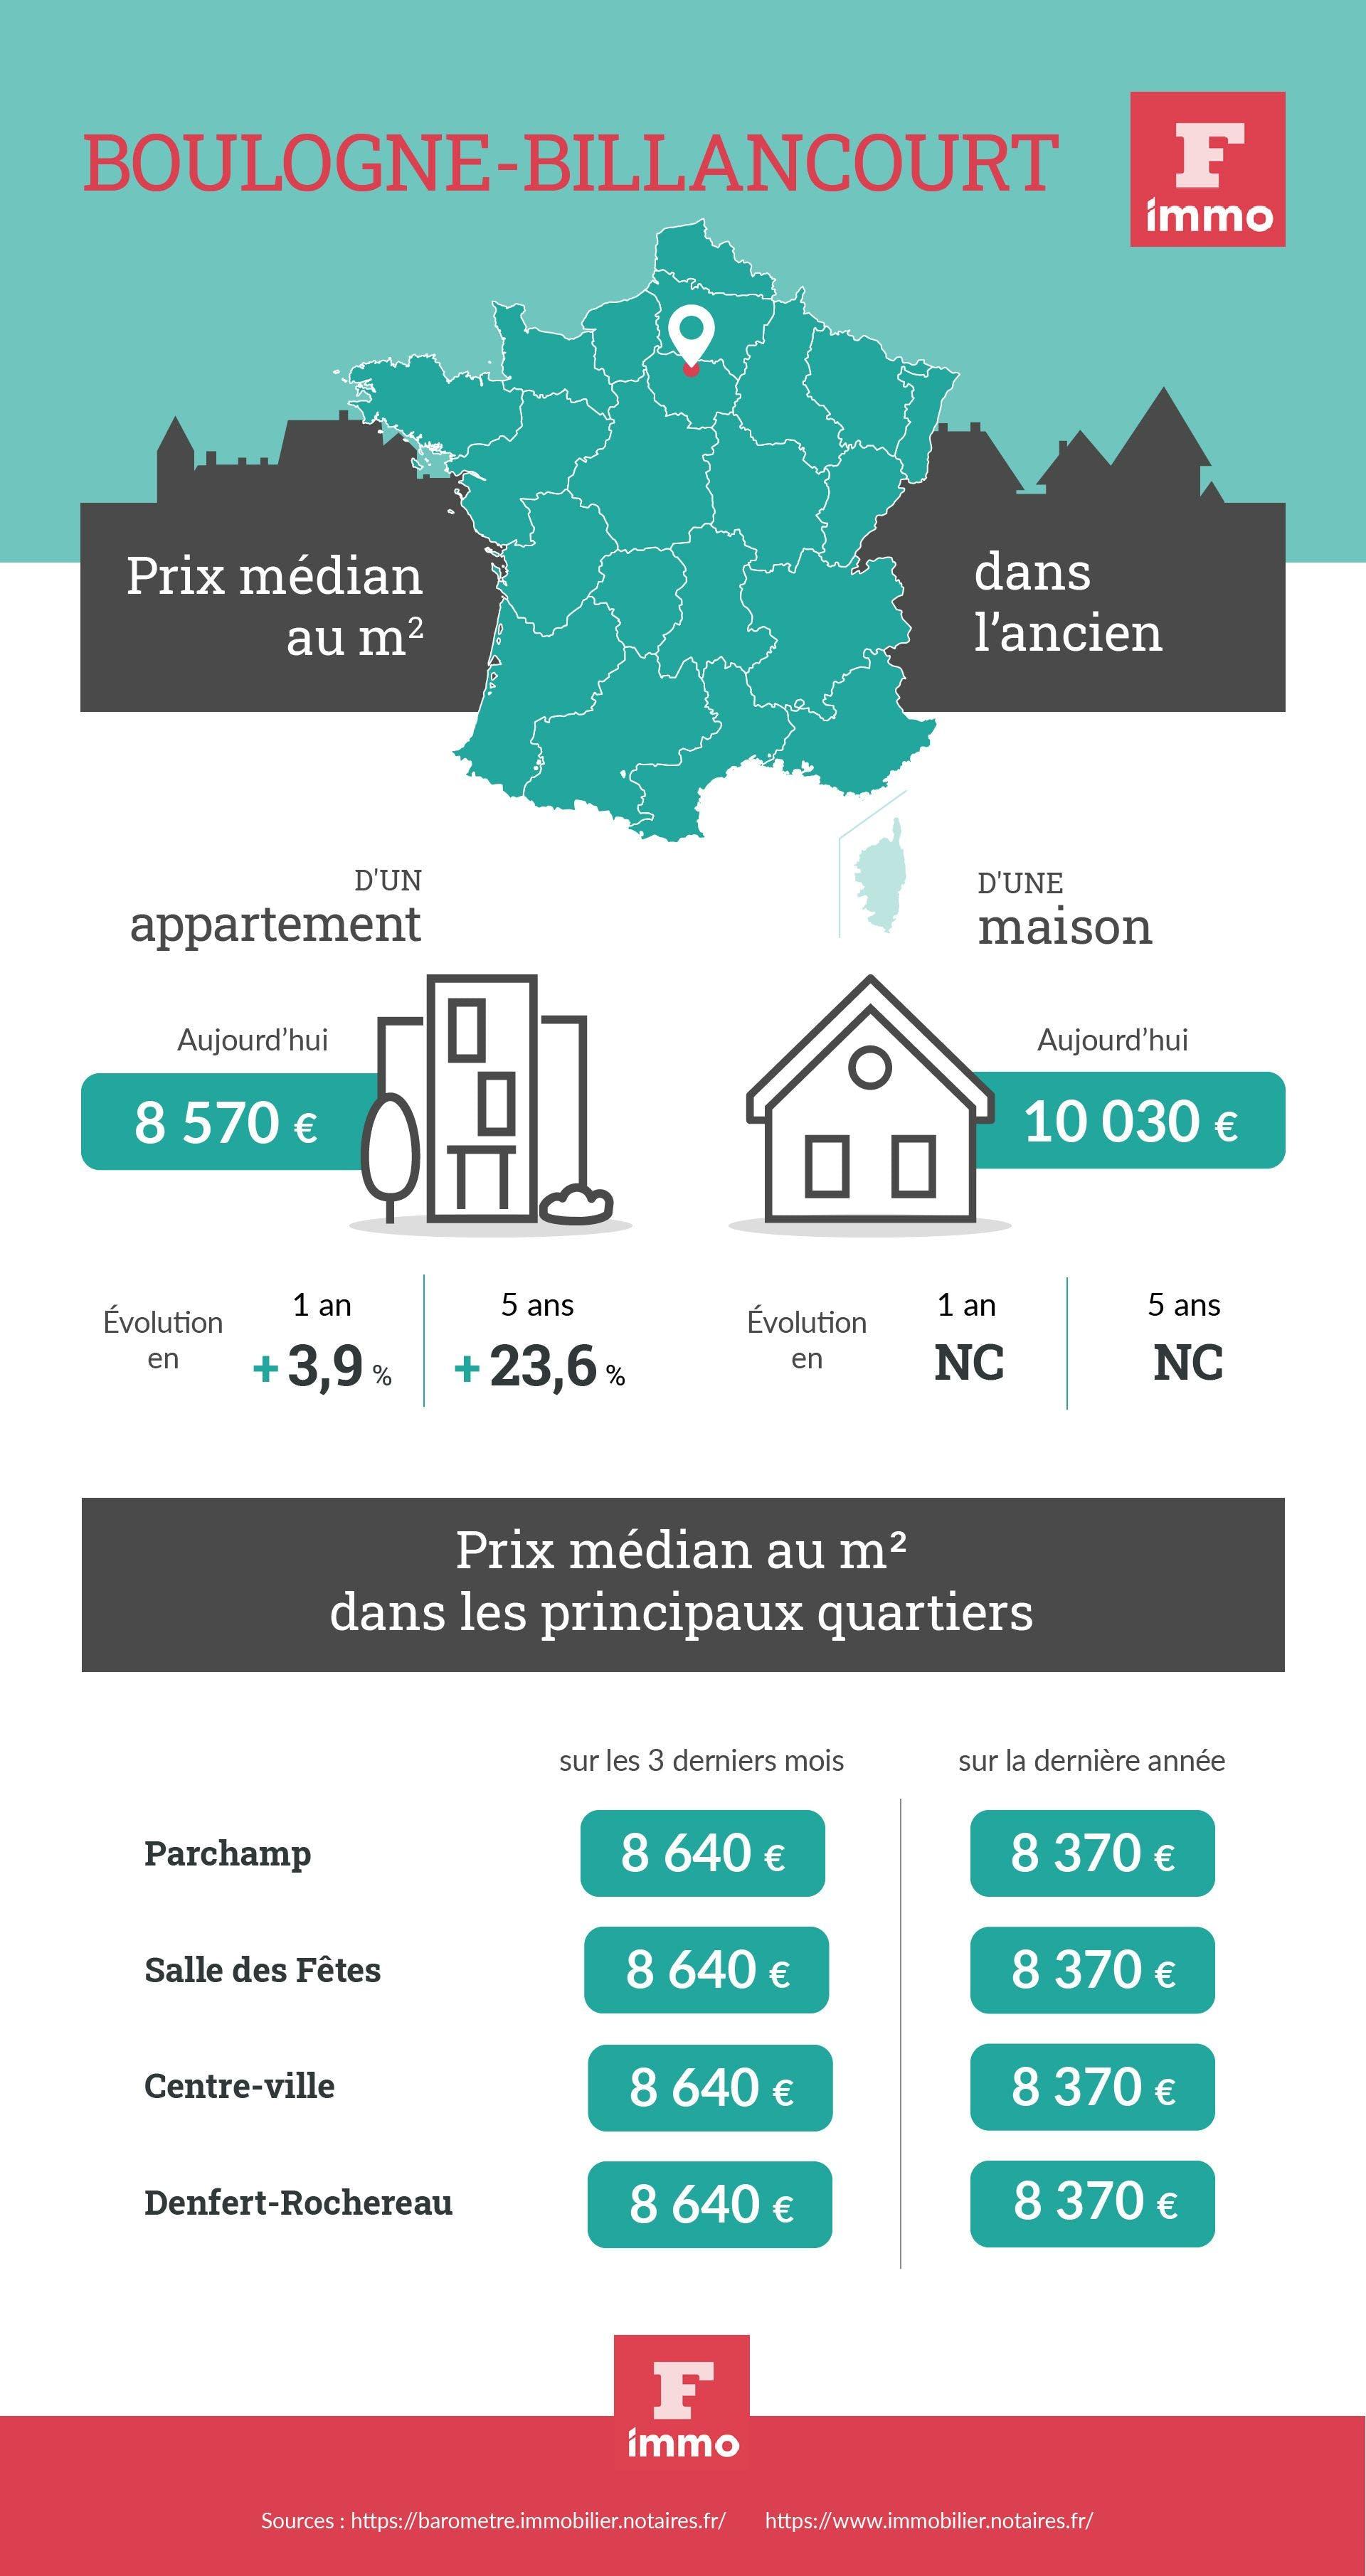 infographie Boulogne-Billancourt